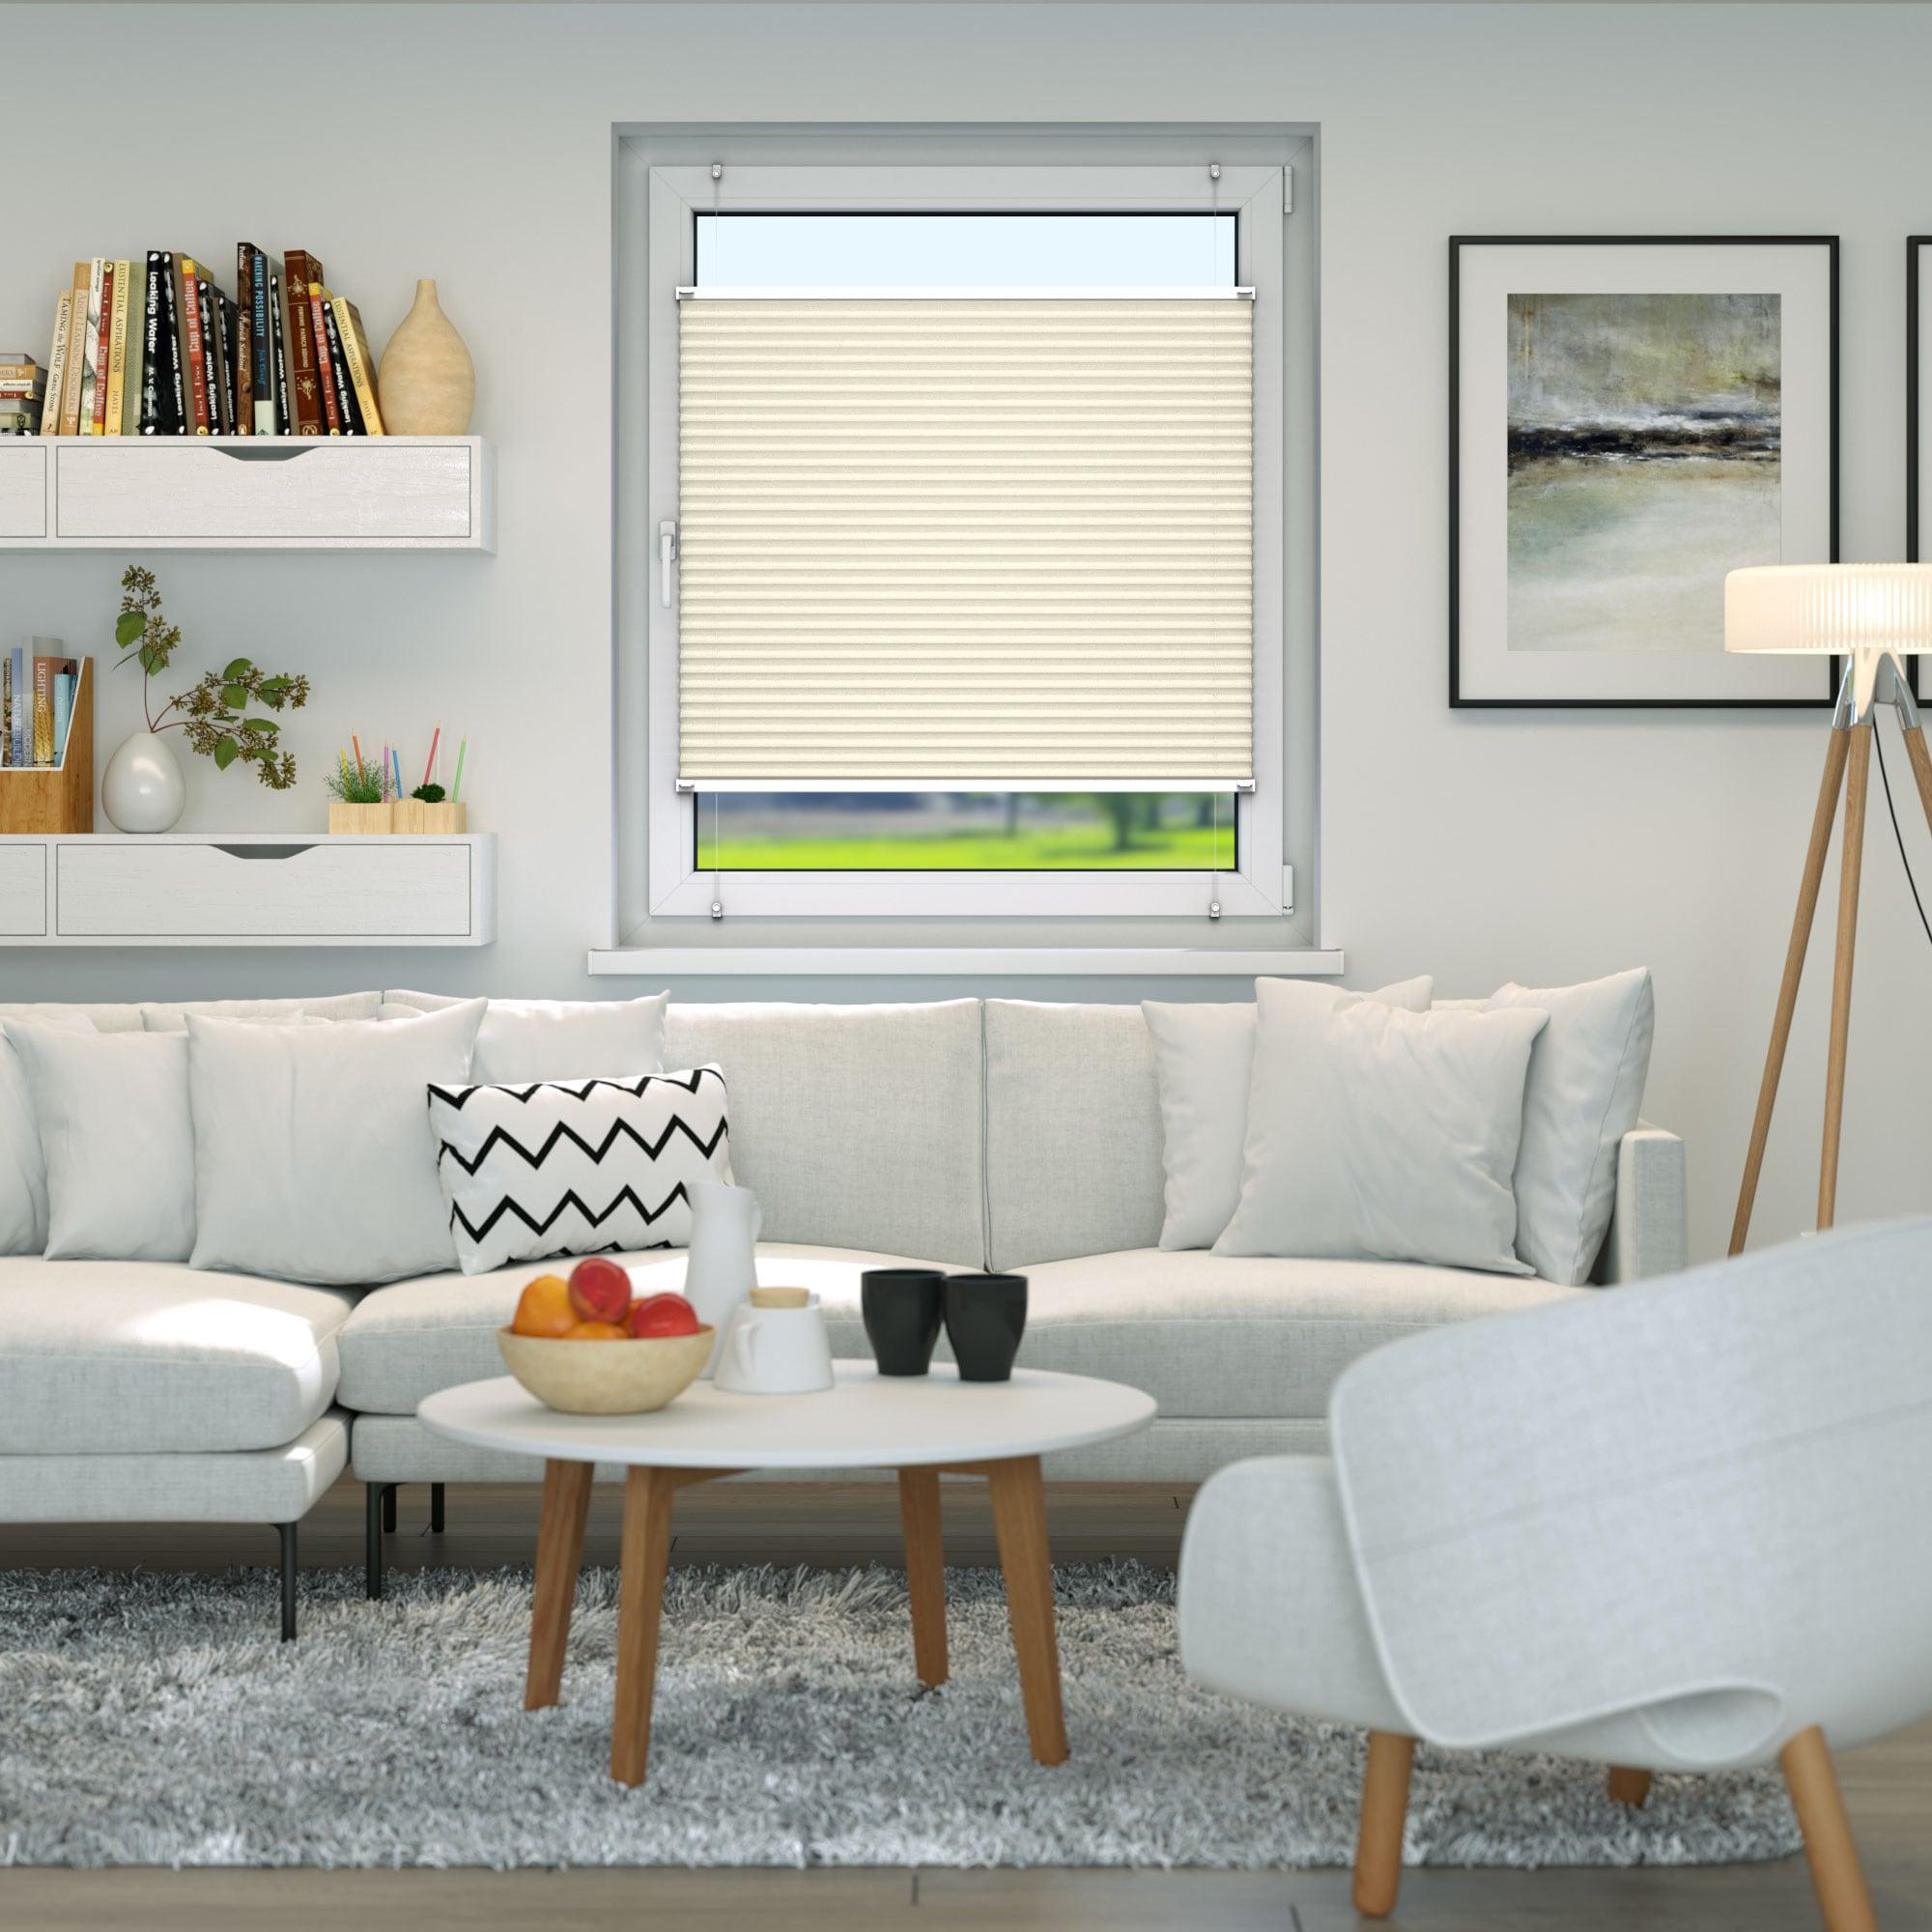 Klemmfix-Plissee-Faltrollo-ohne-Bohren-Fenster-Tuer-Plisseerollo-Plisee-Easyfix Indexbild 27